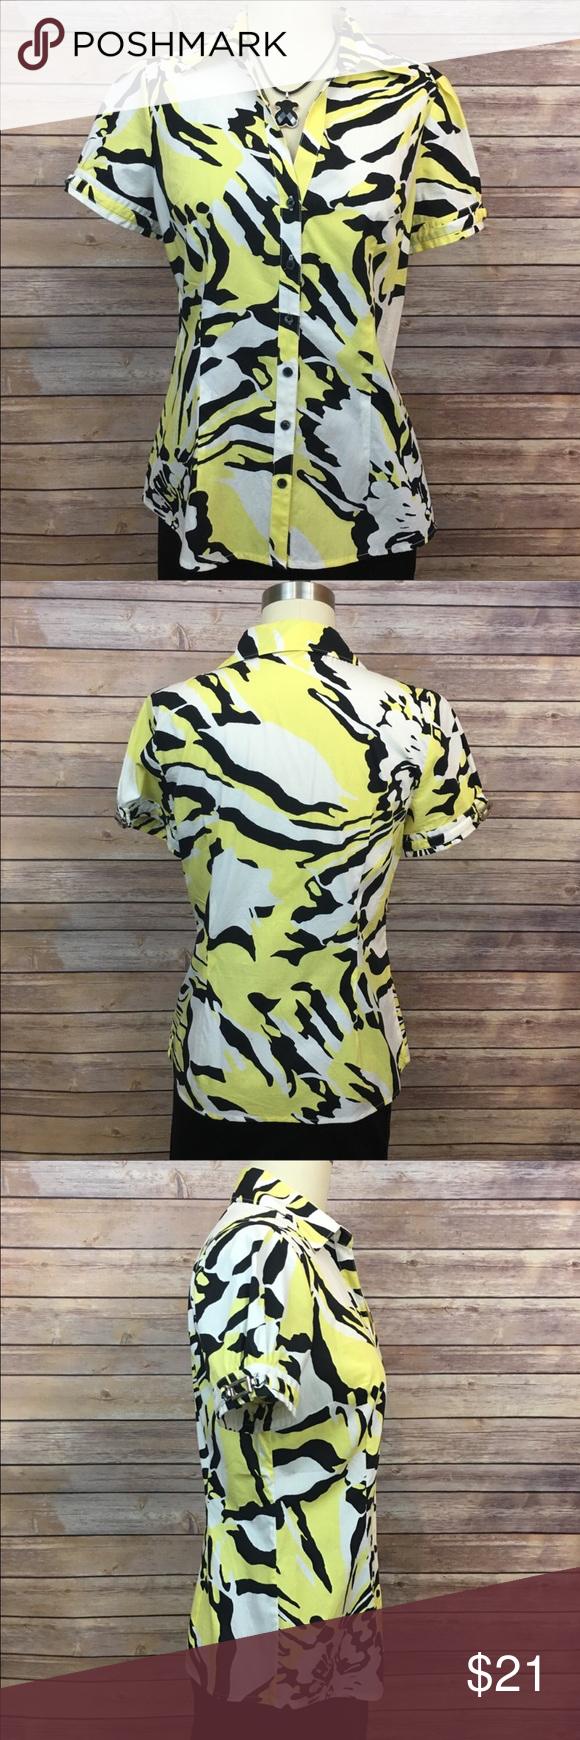 White t shirt express - Express Short Sleeve Button Down Shirt Express Yellow Black And White Short Sleeve Shirt